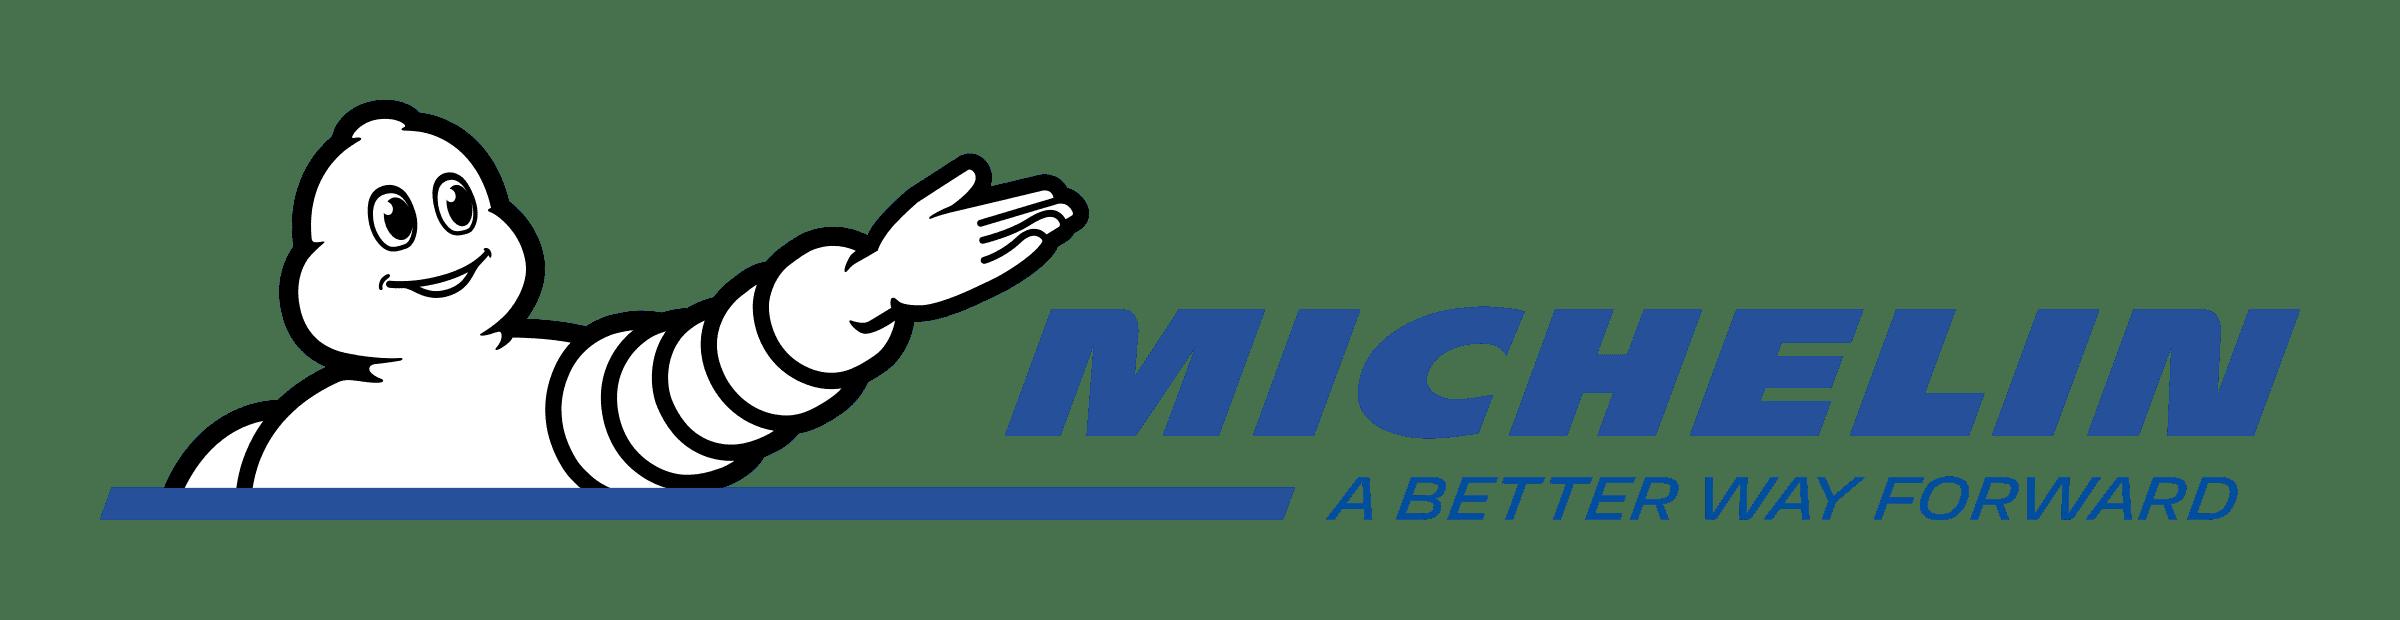 Begini Ban Masa Depan Tanpa Udara Dari Michelin